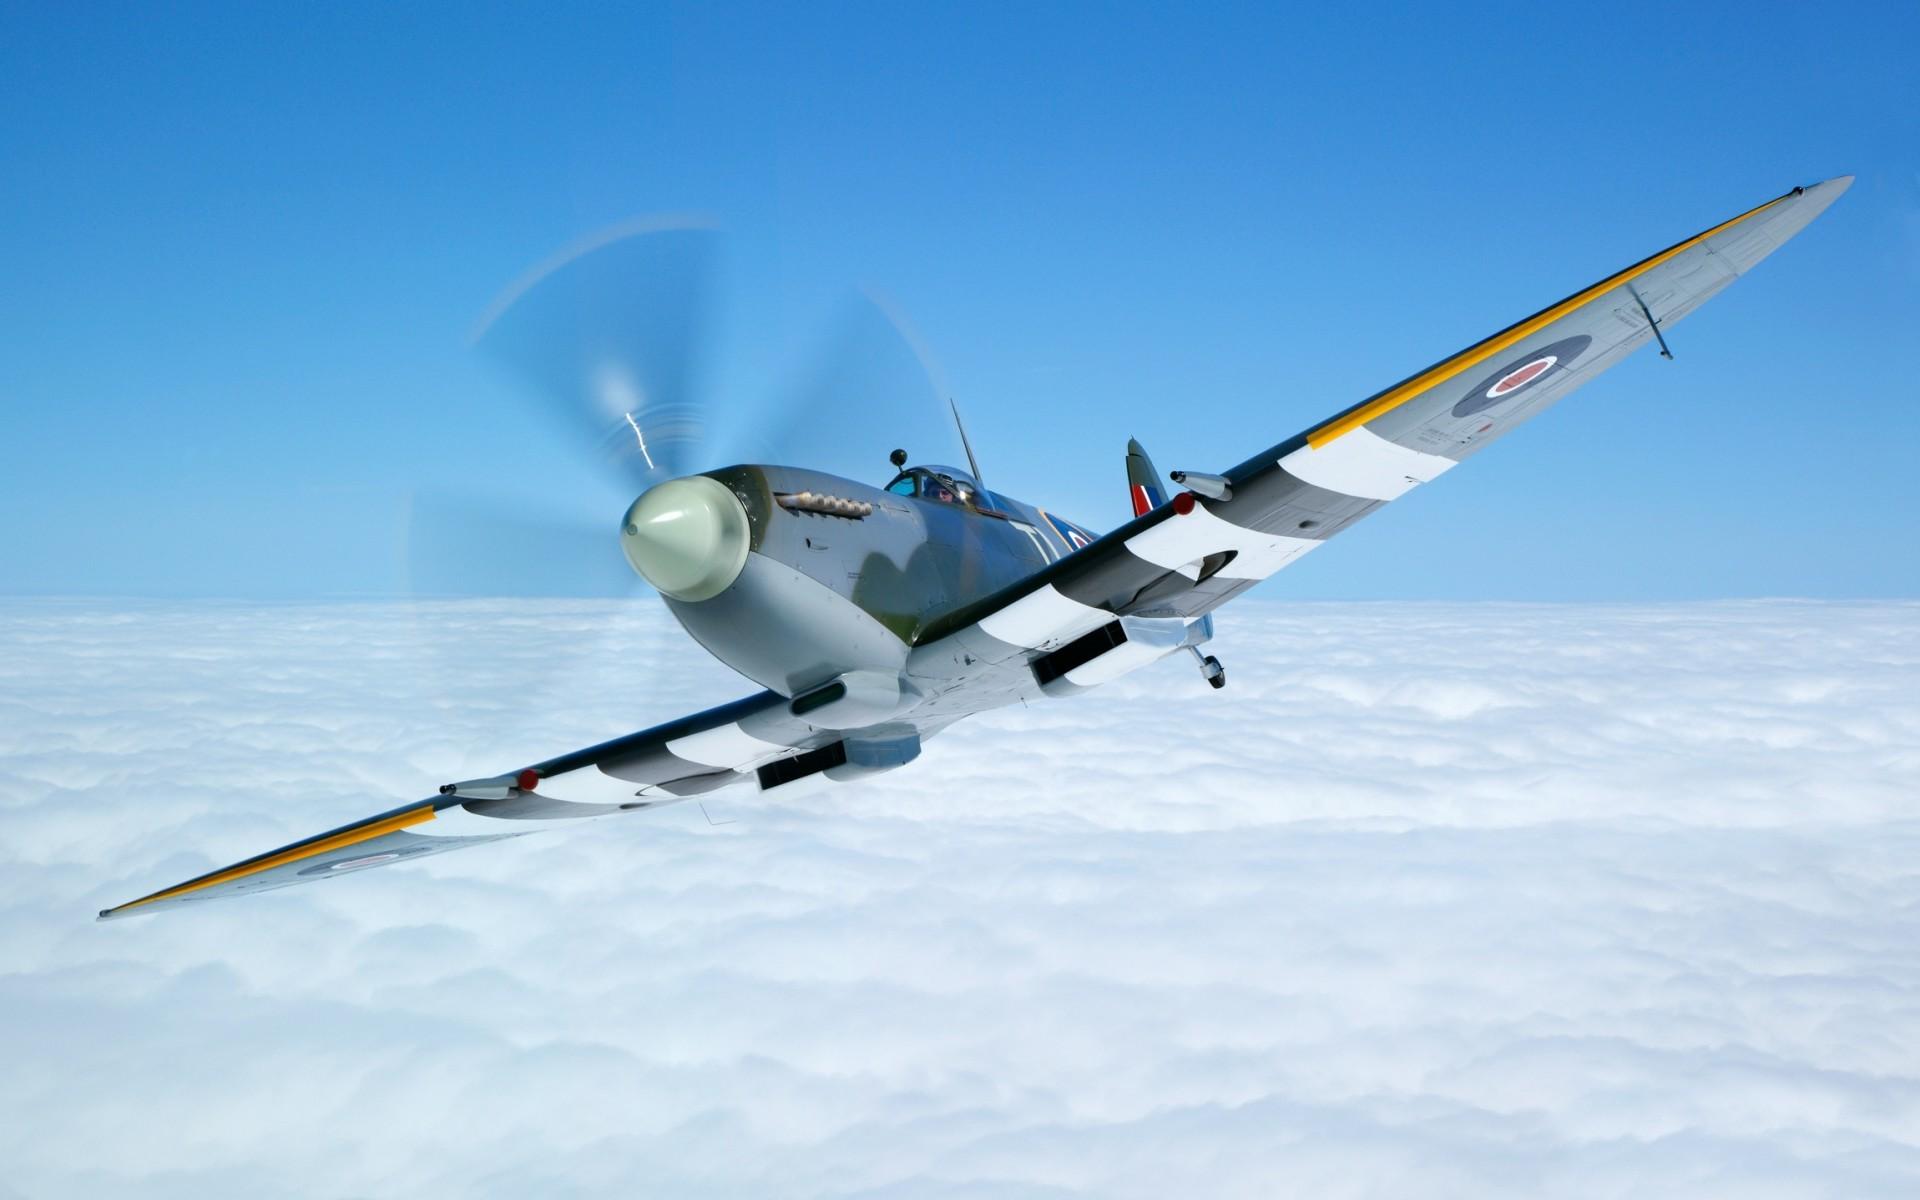 Res: 1920x1200, Wallpaper of Aircraft, Supermarine Spitfire, Warplane background & HD image